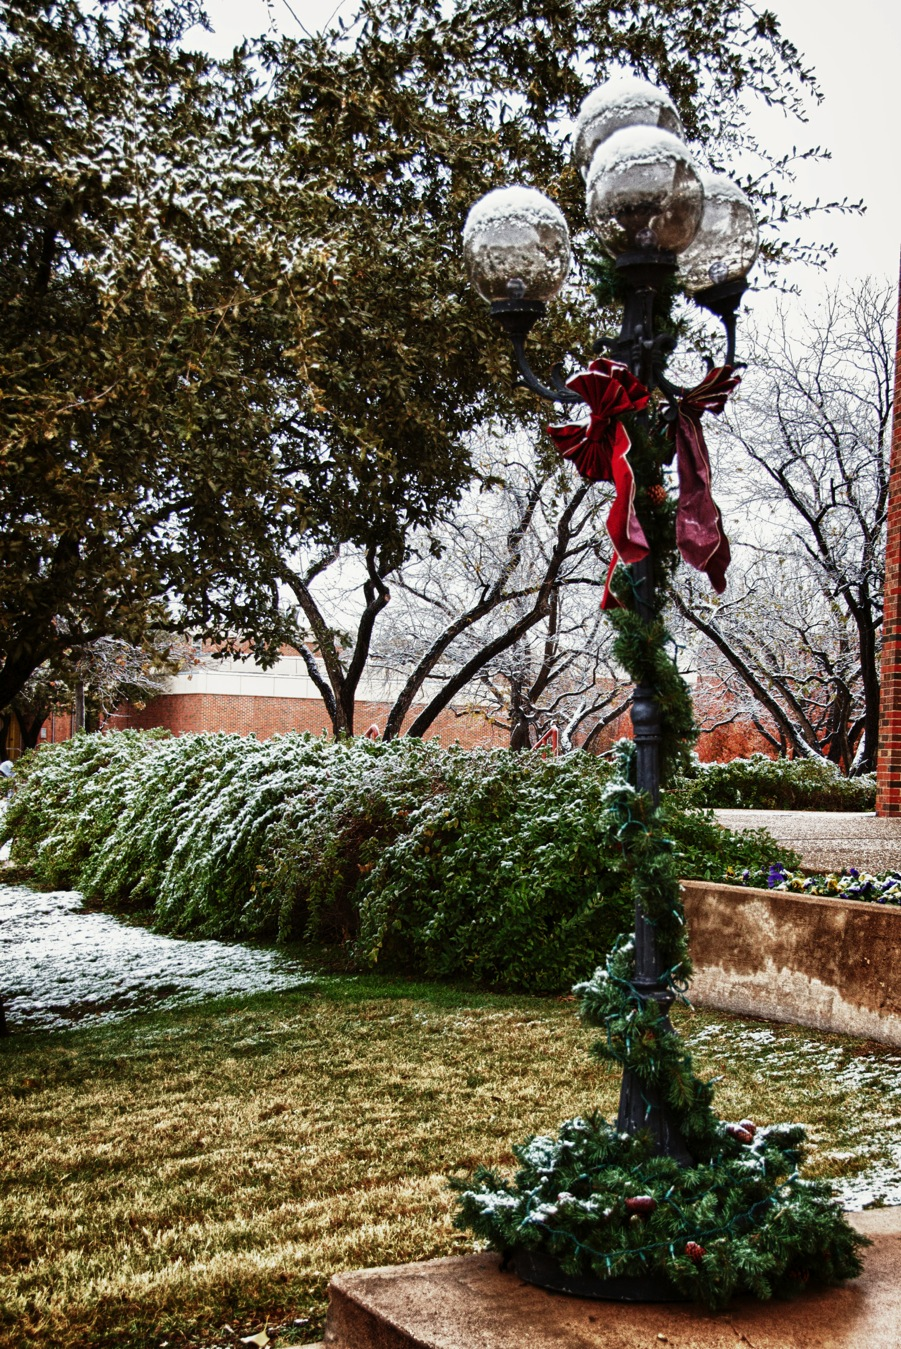 Three-bulb light standard and Christmas wreath